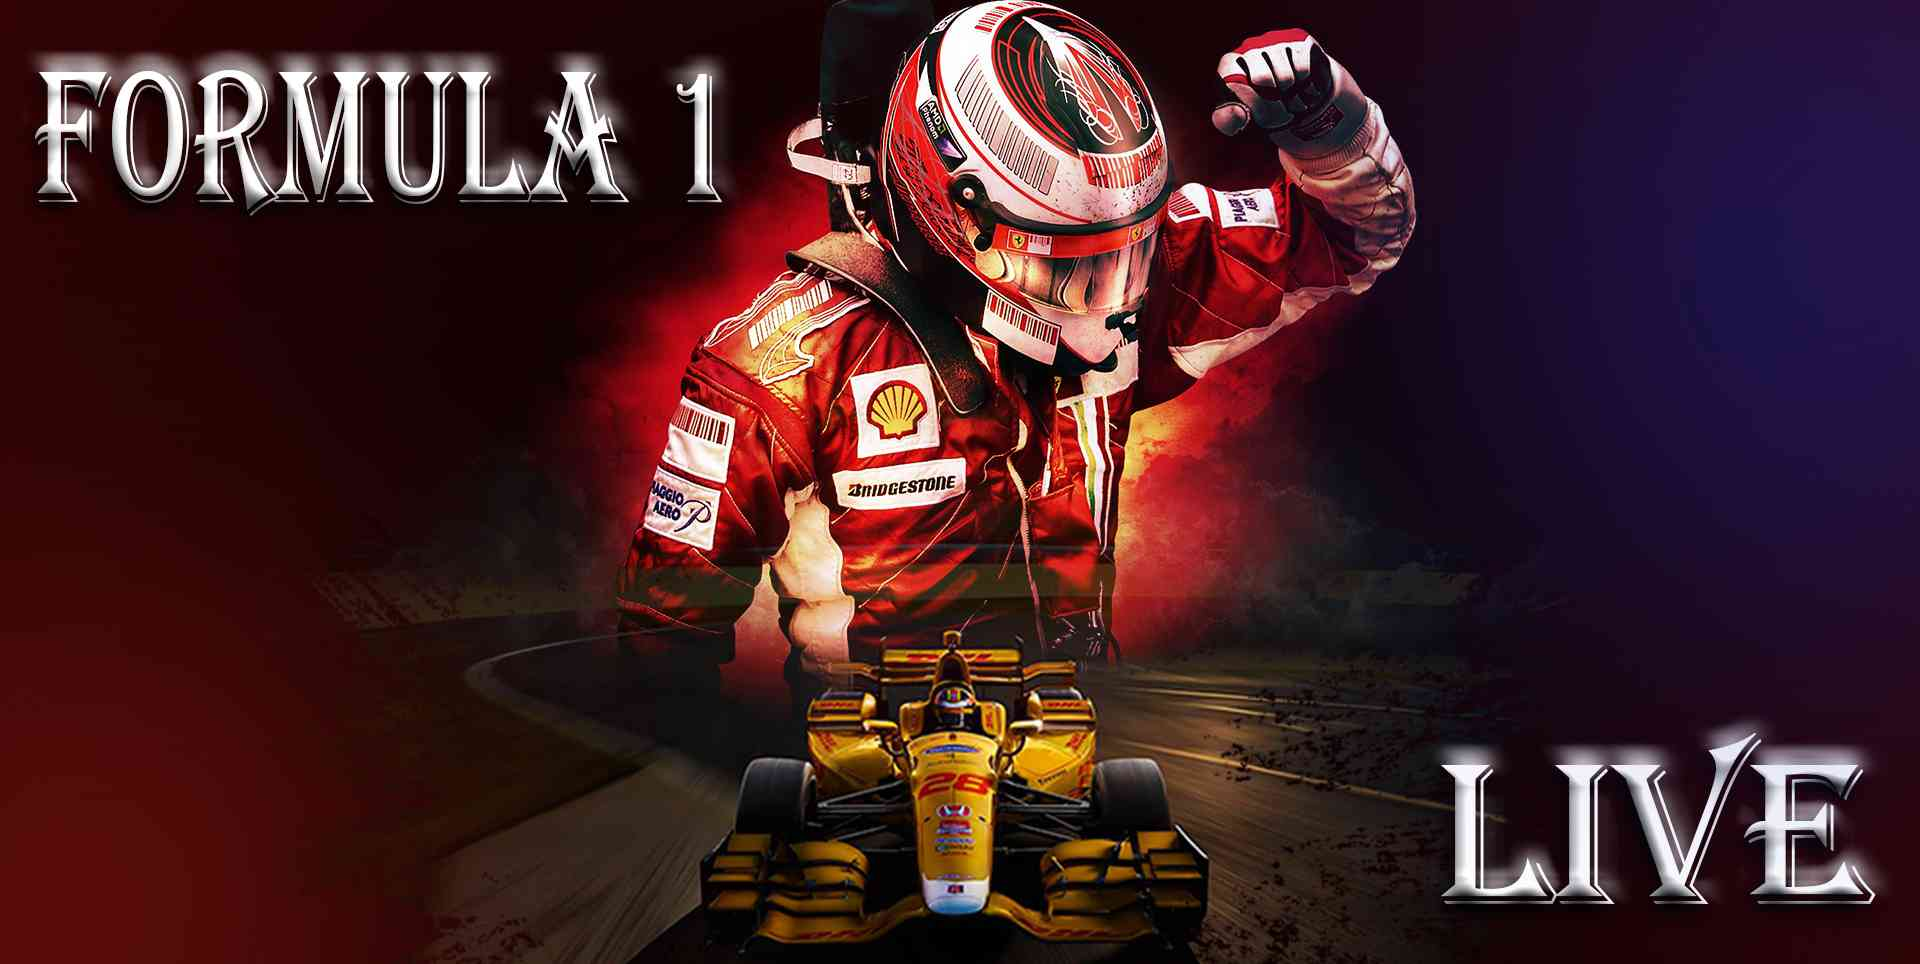 gp-of-pau-2016-formula-3-race-live-stream